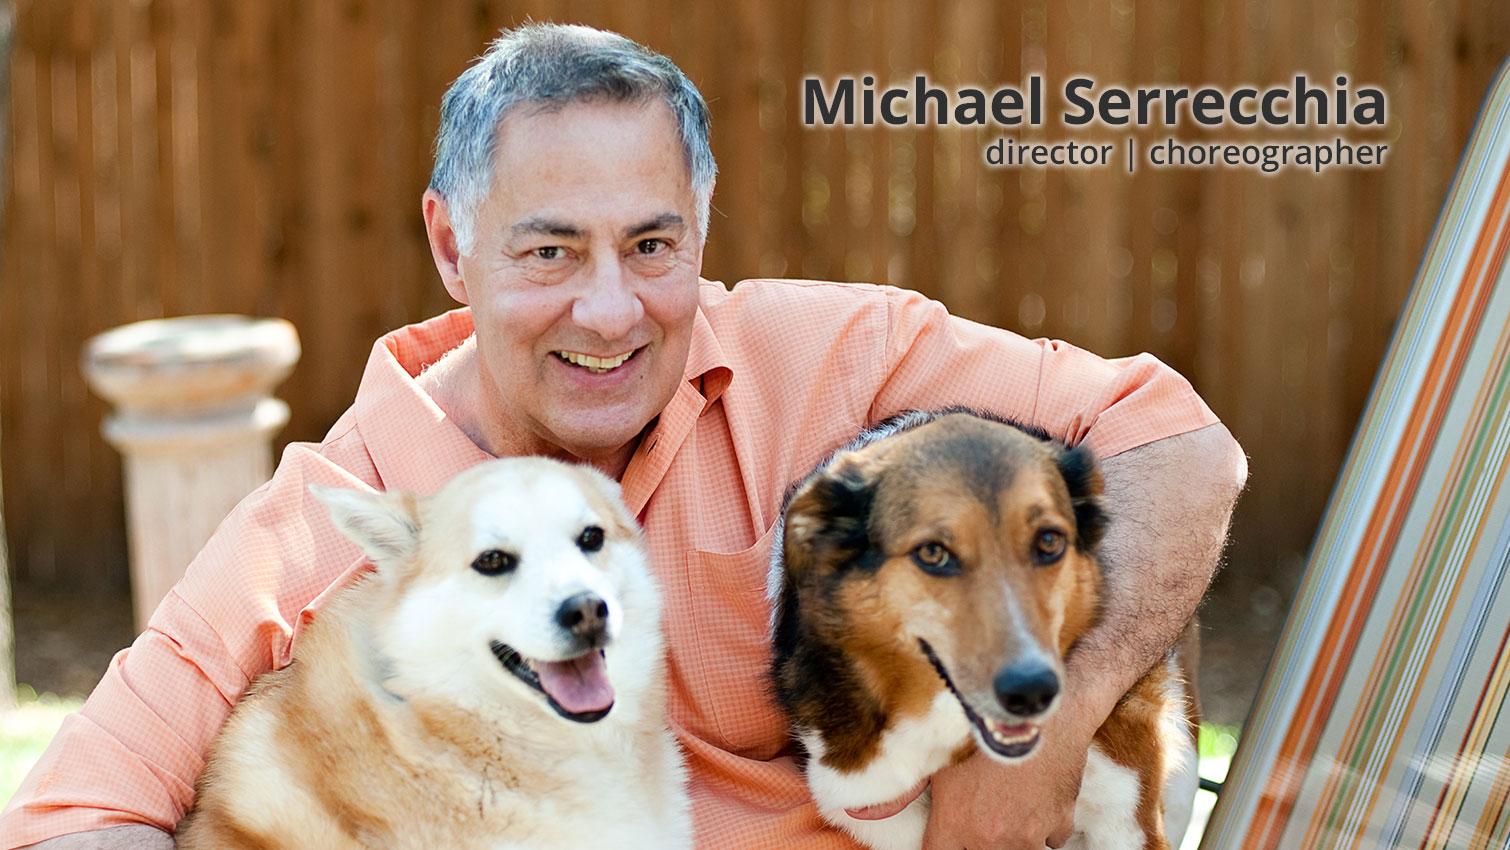 Michael Serrecchia | director | choreographer